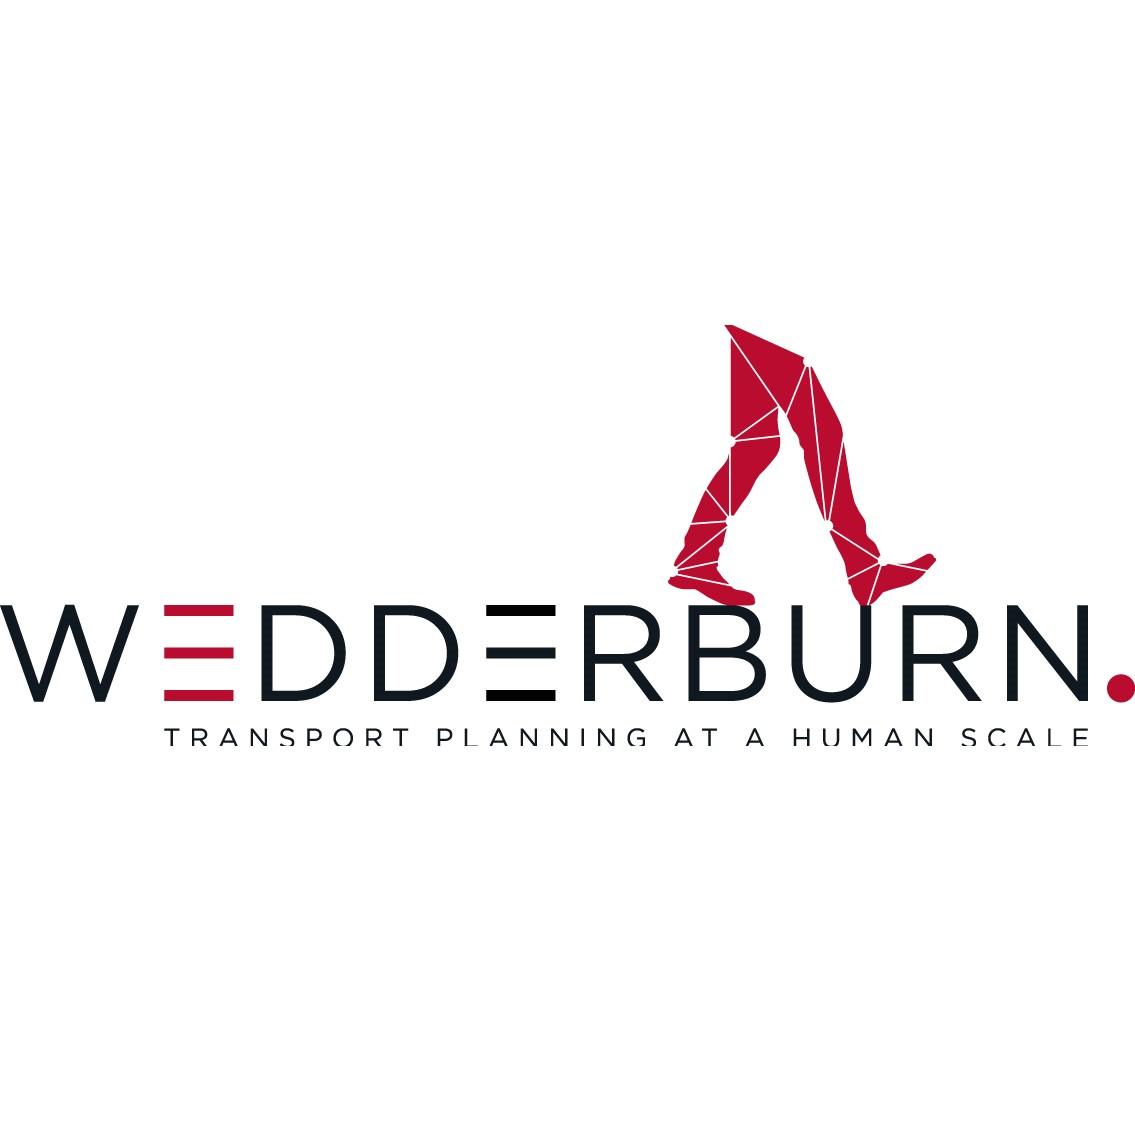 Wedderburn Transport Planning Ltd